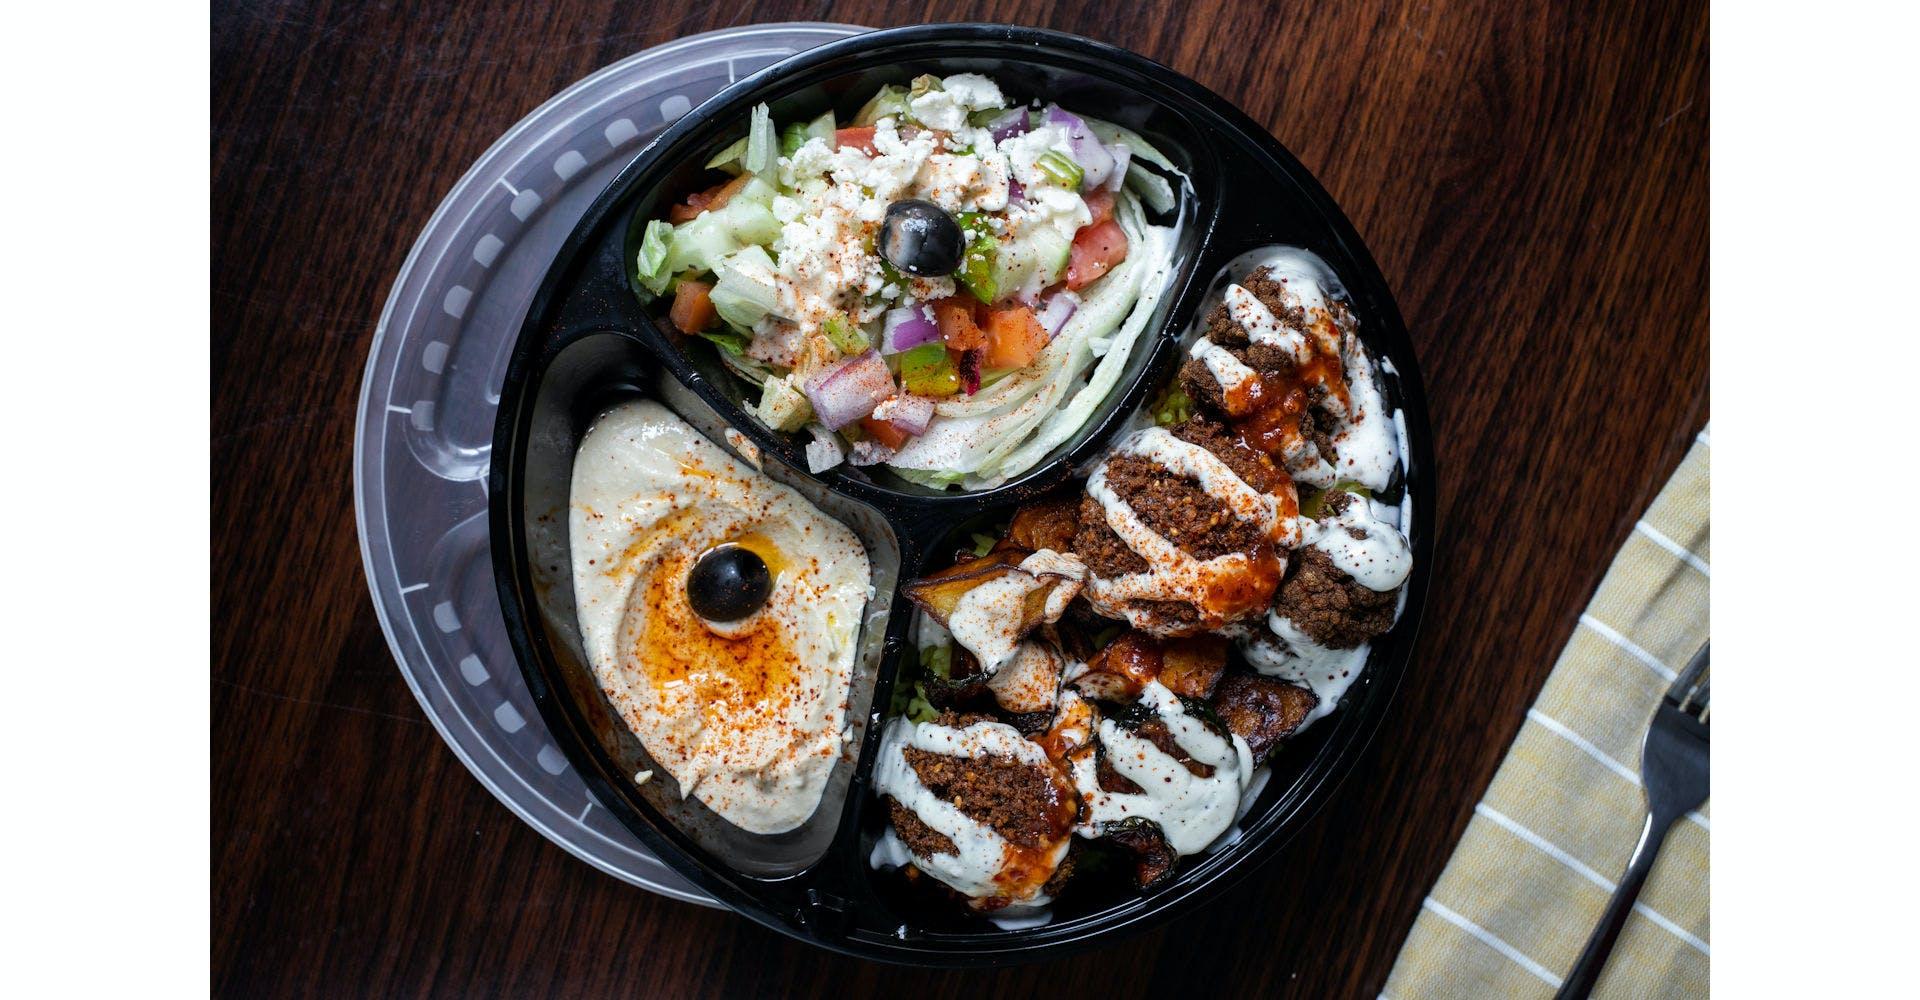 Veggie Plate from Austin's Habibi in Austin, TX